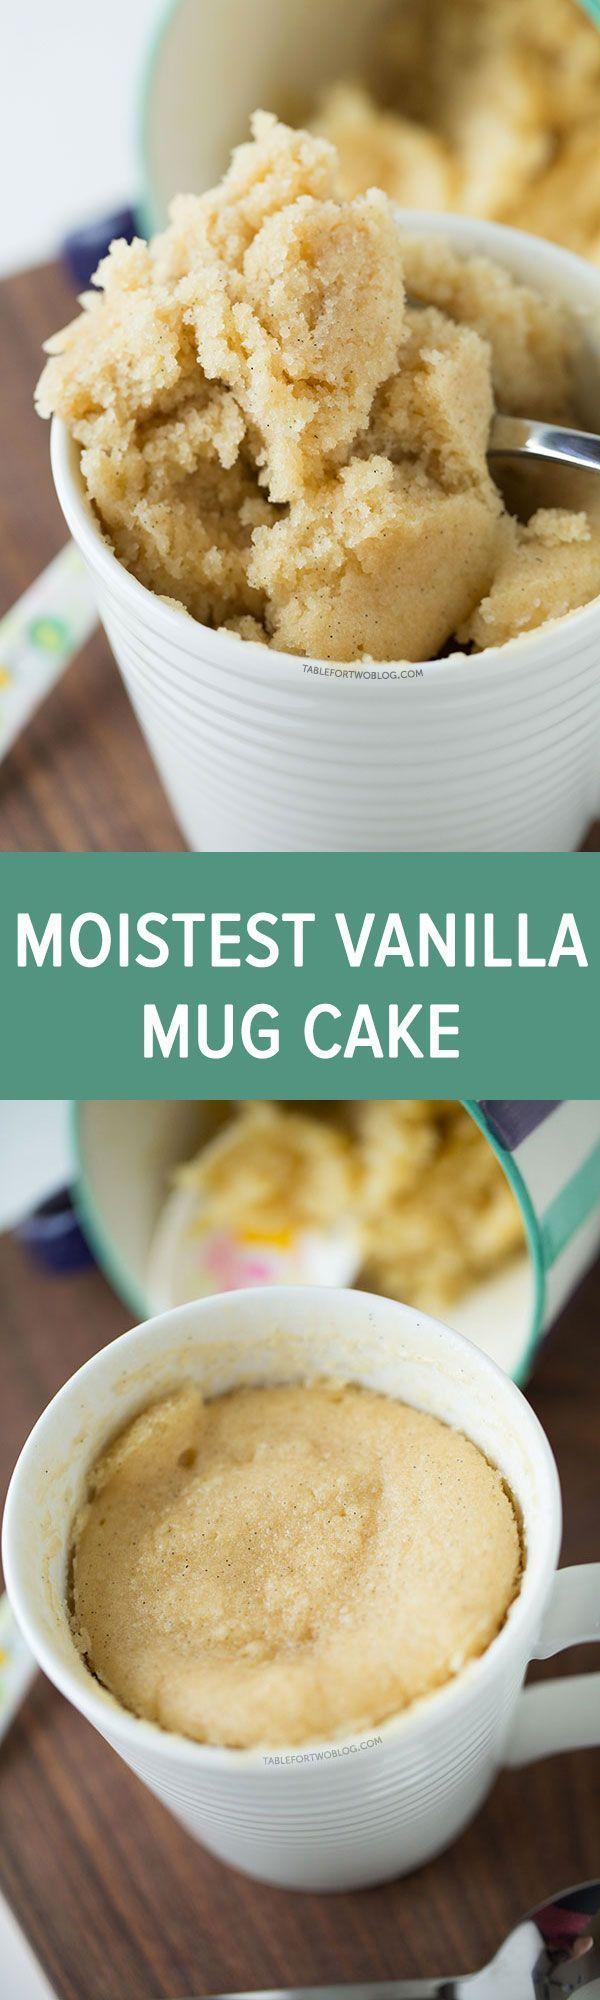 The moistest very vanilla mug cake is like a fluffy ...